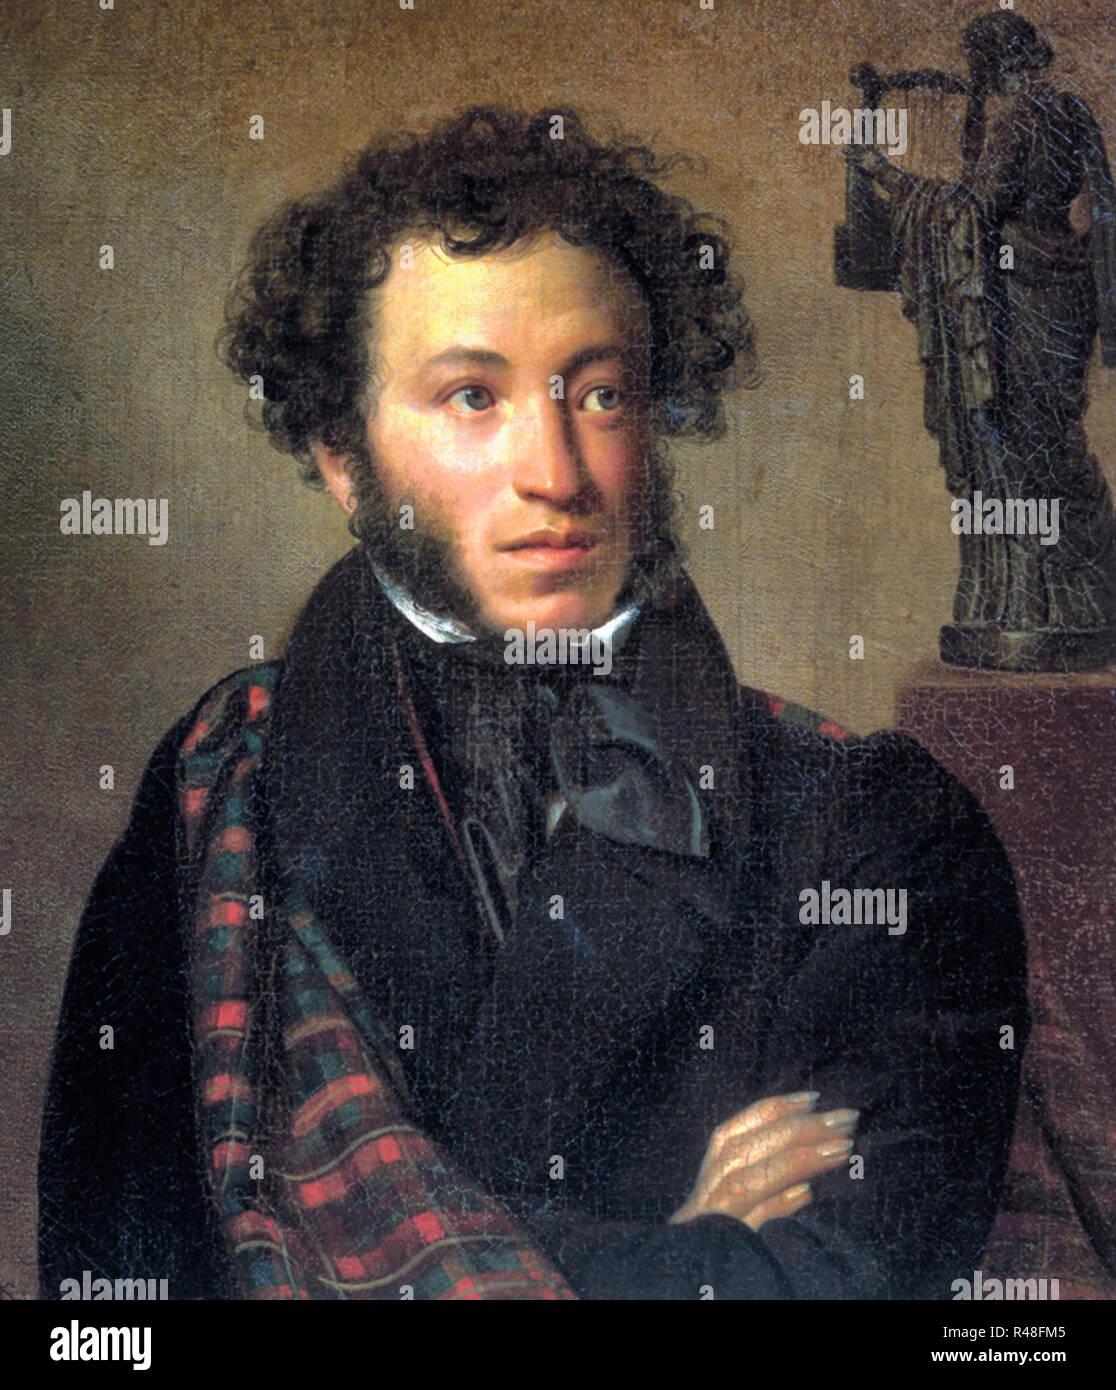 Portrait of Alexander Pushkin - Orest Kiprensky, circa 1827 - Stock Image